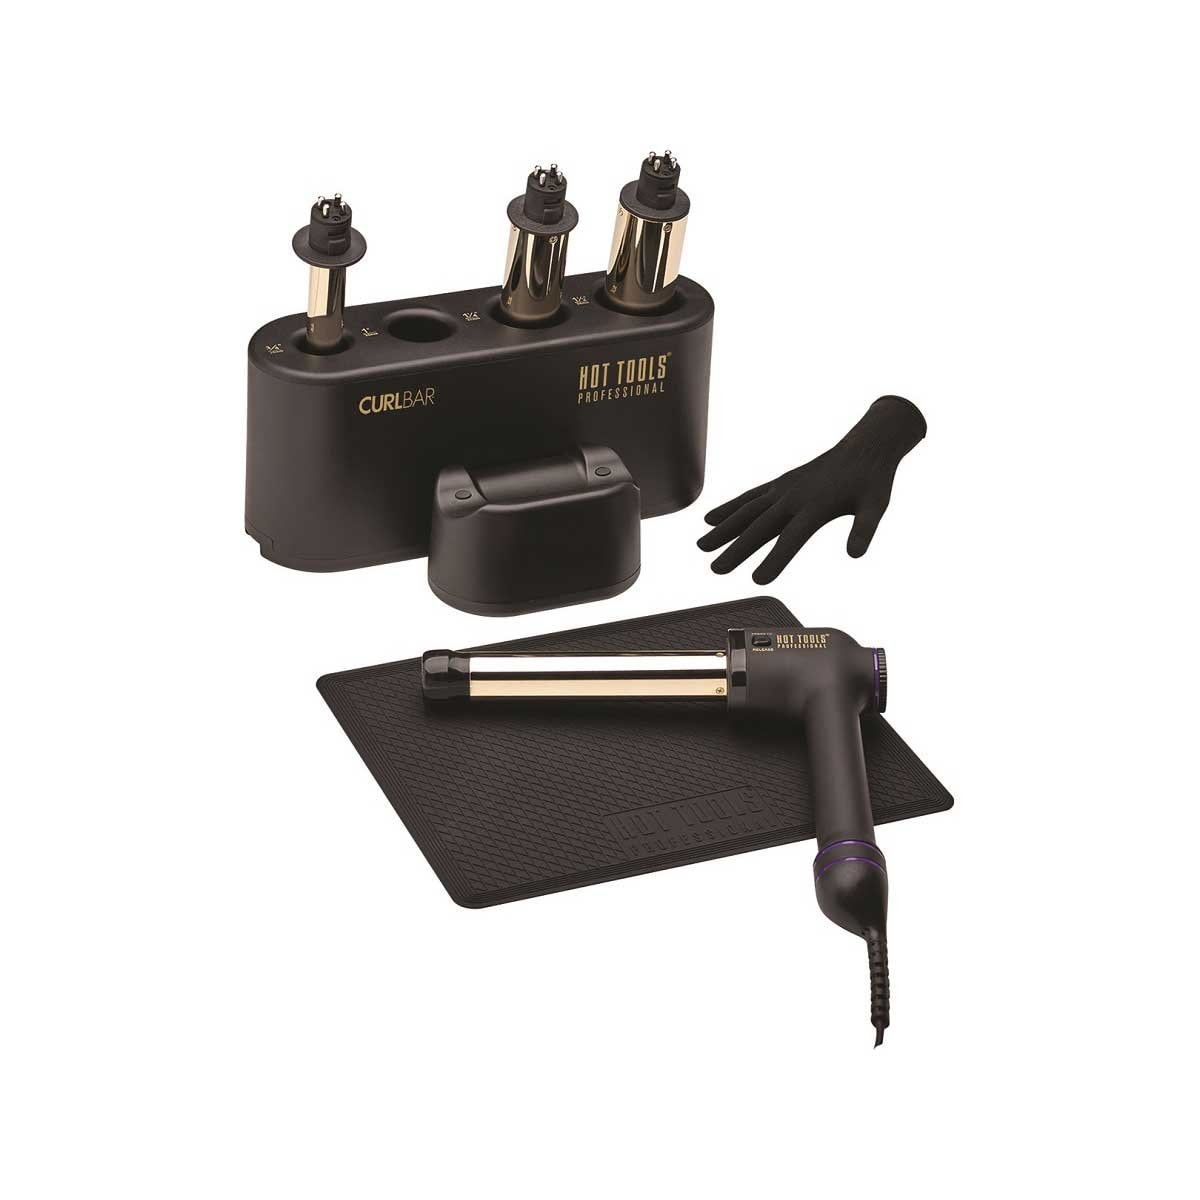 Set con 4 Barriles Intercambiables Hot Tools